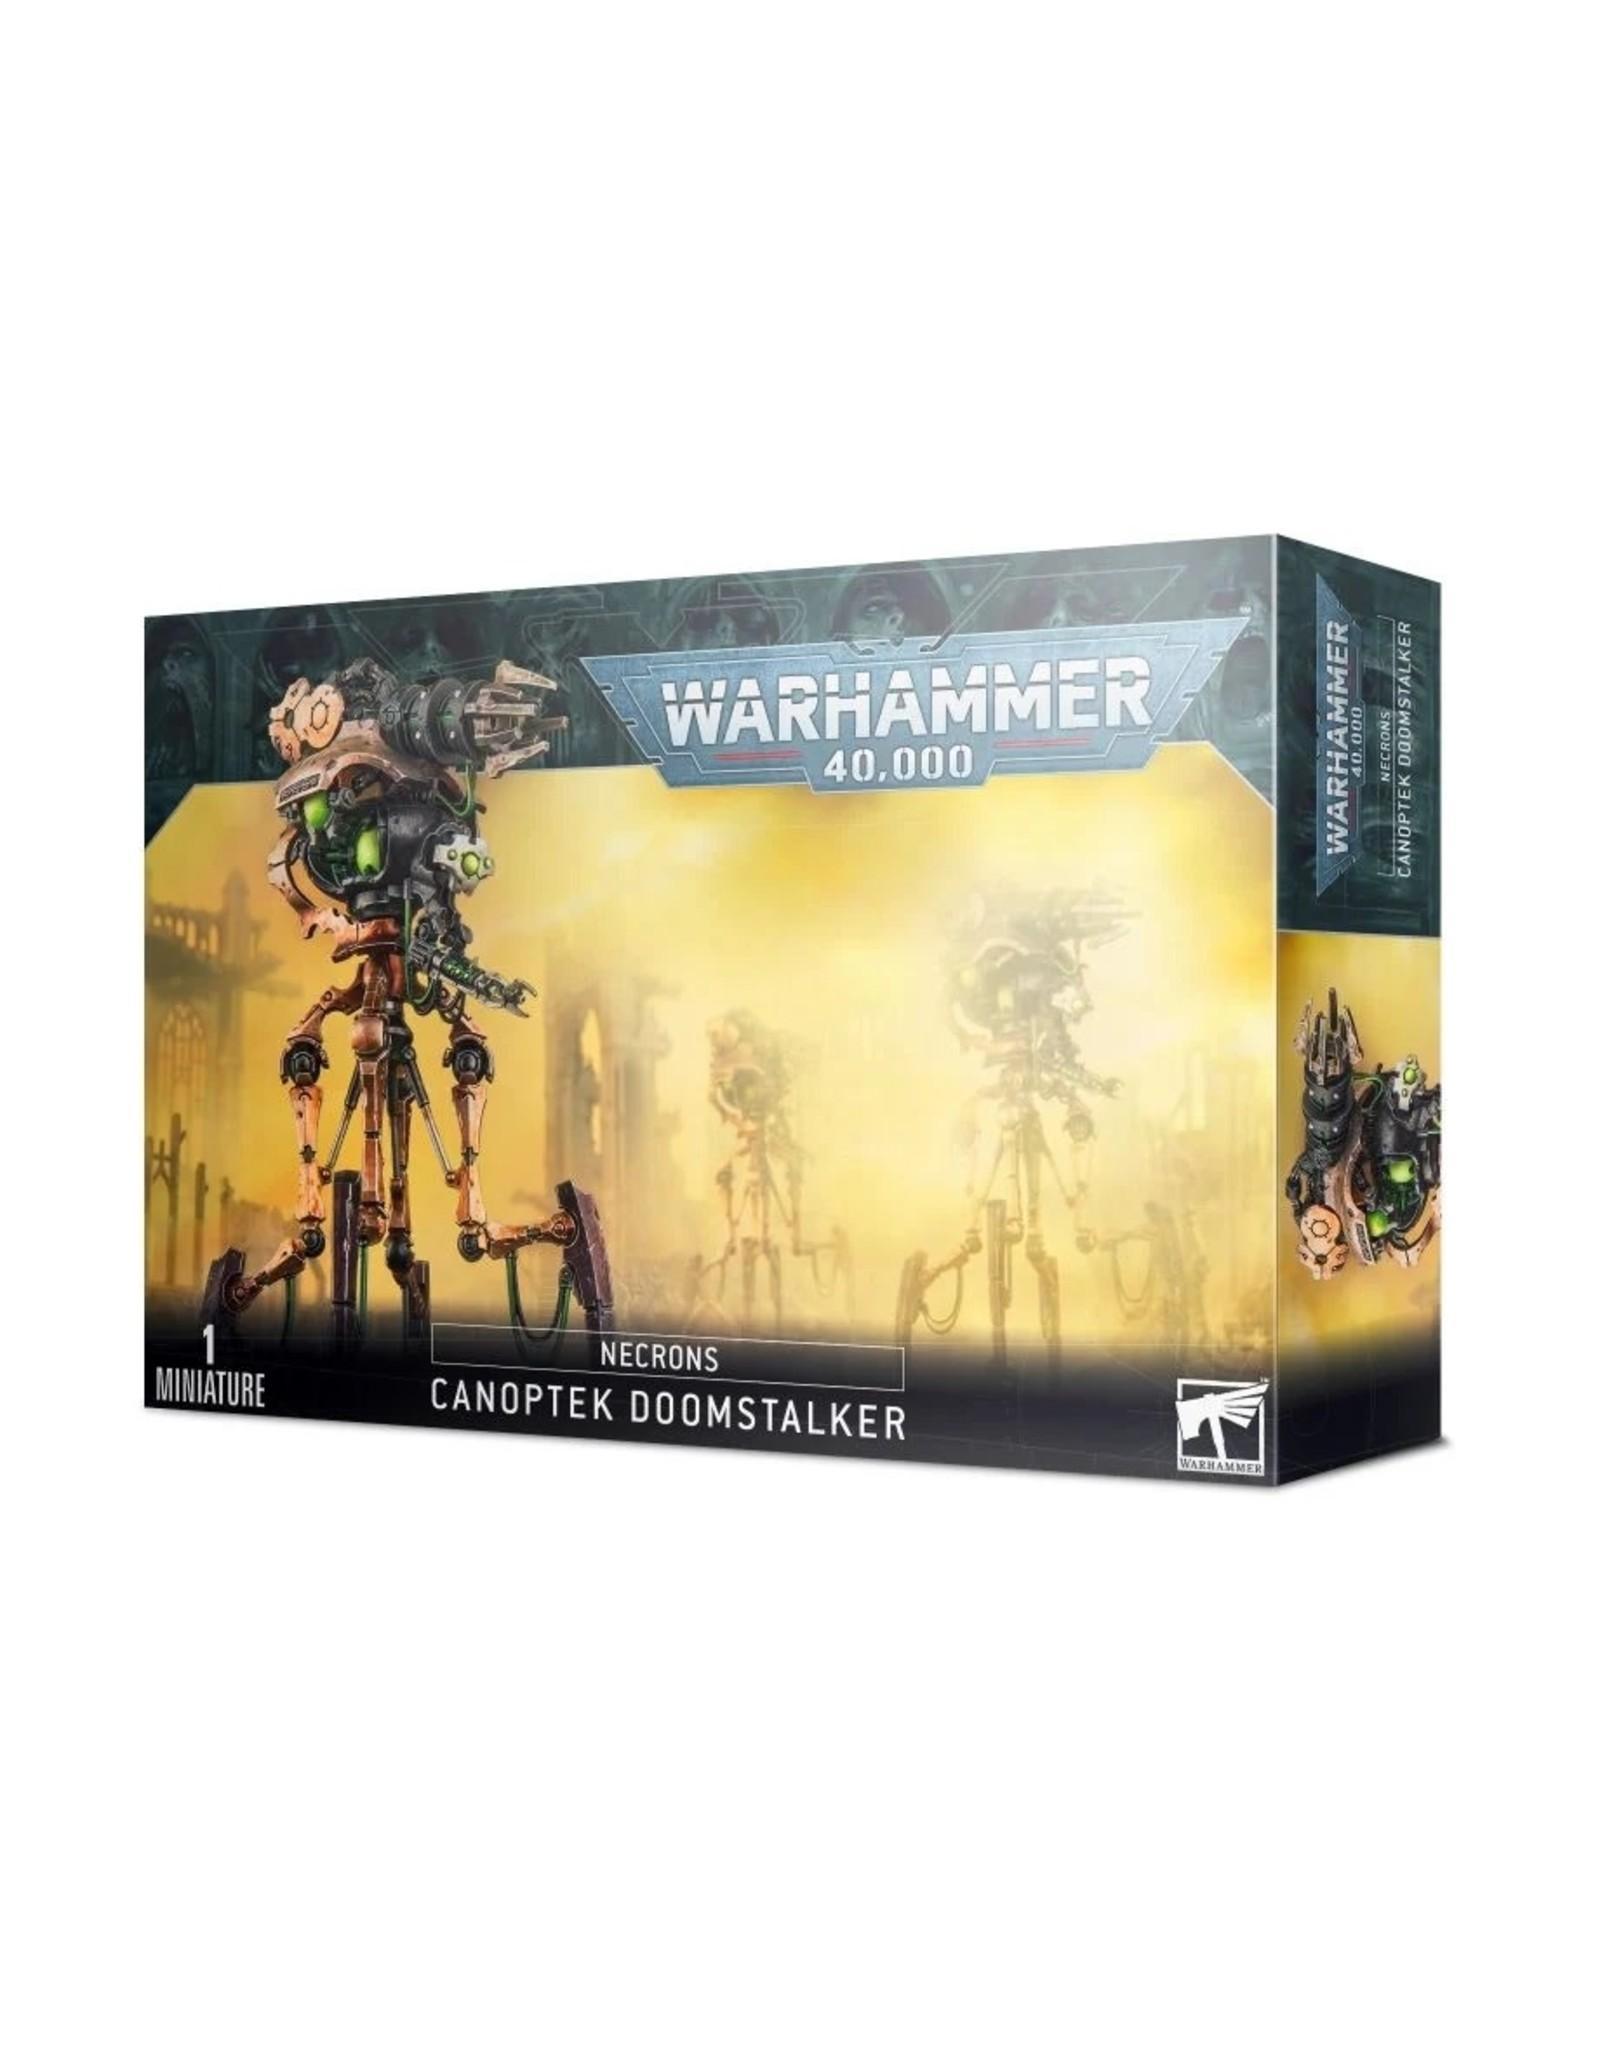 Warhammer 40K WH40K Necron Canoptek Doomstalker